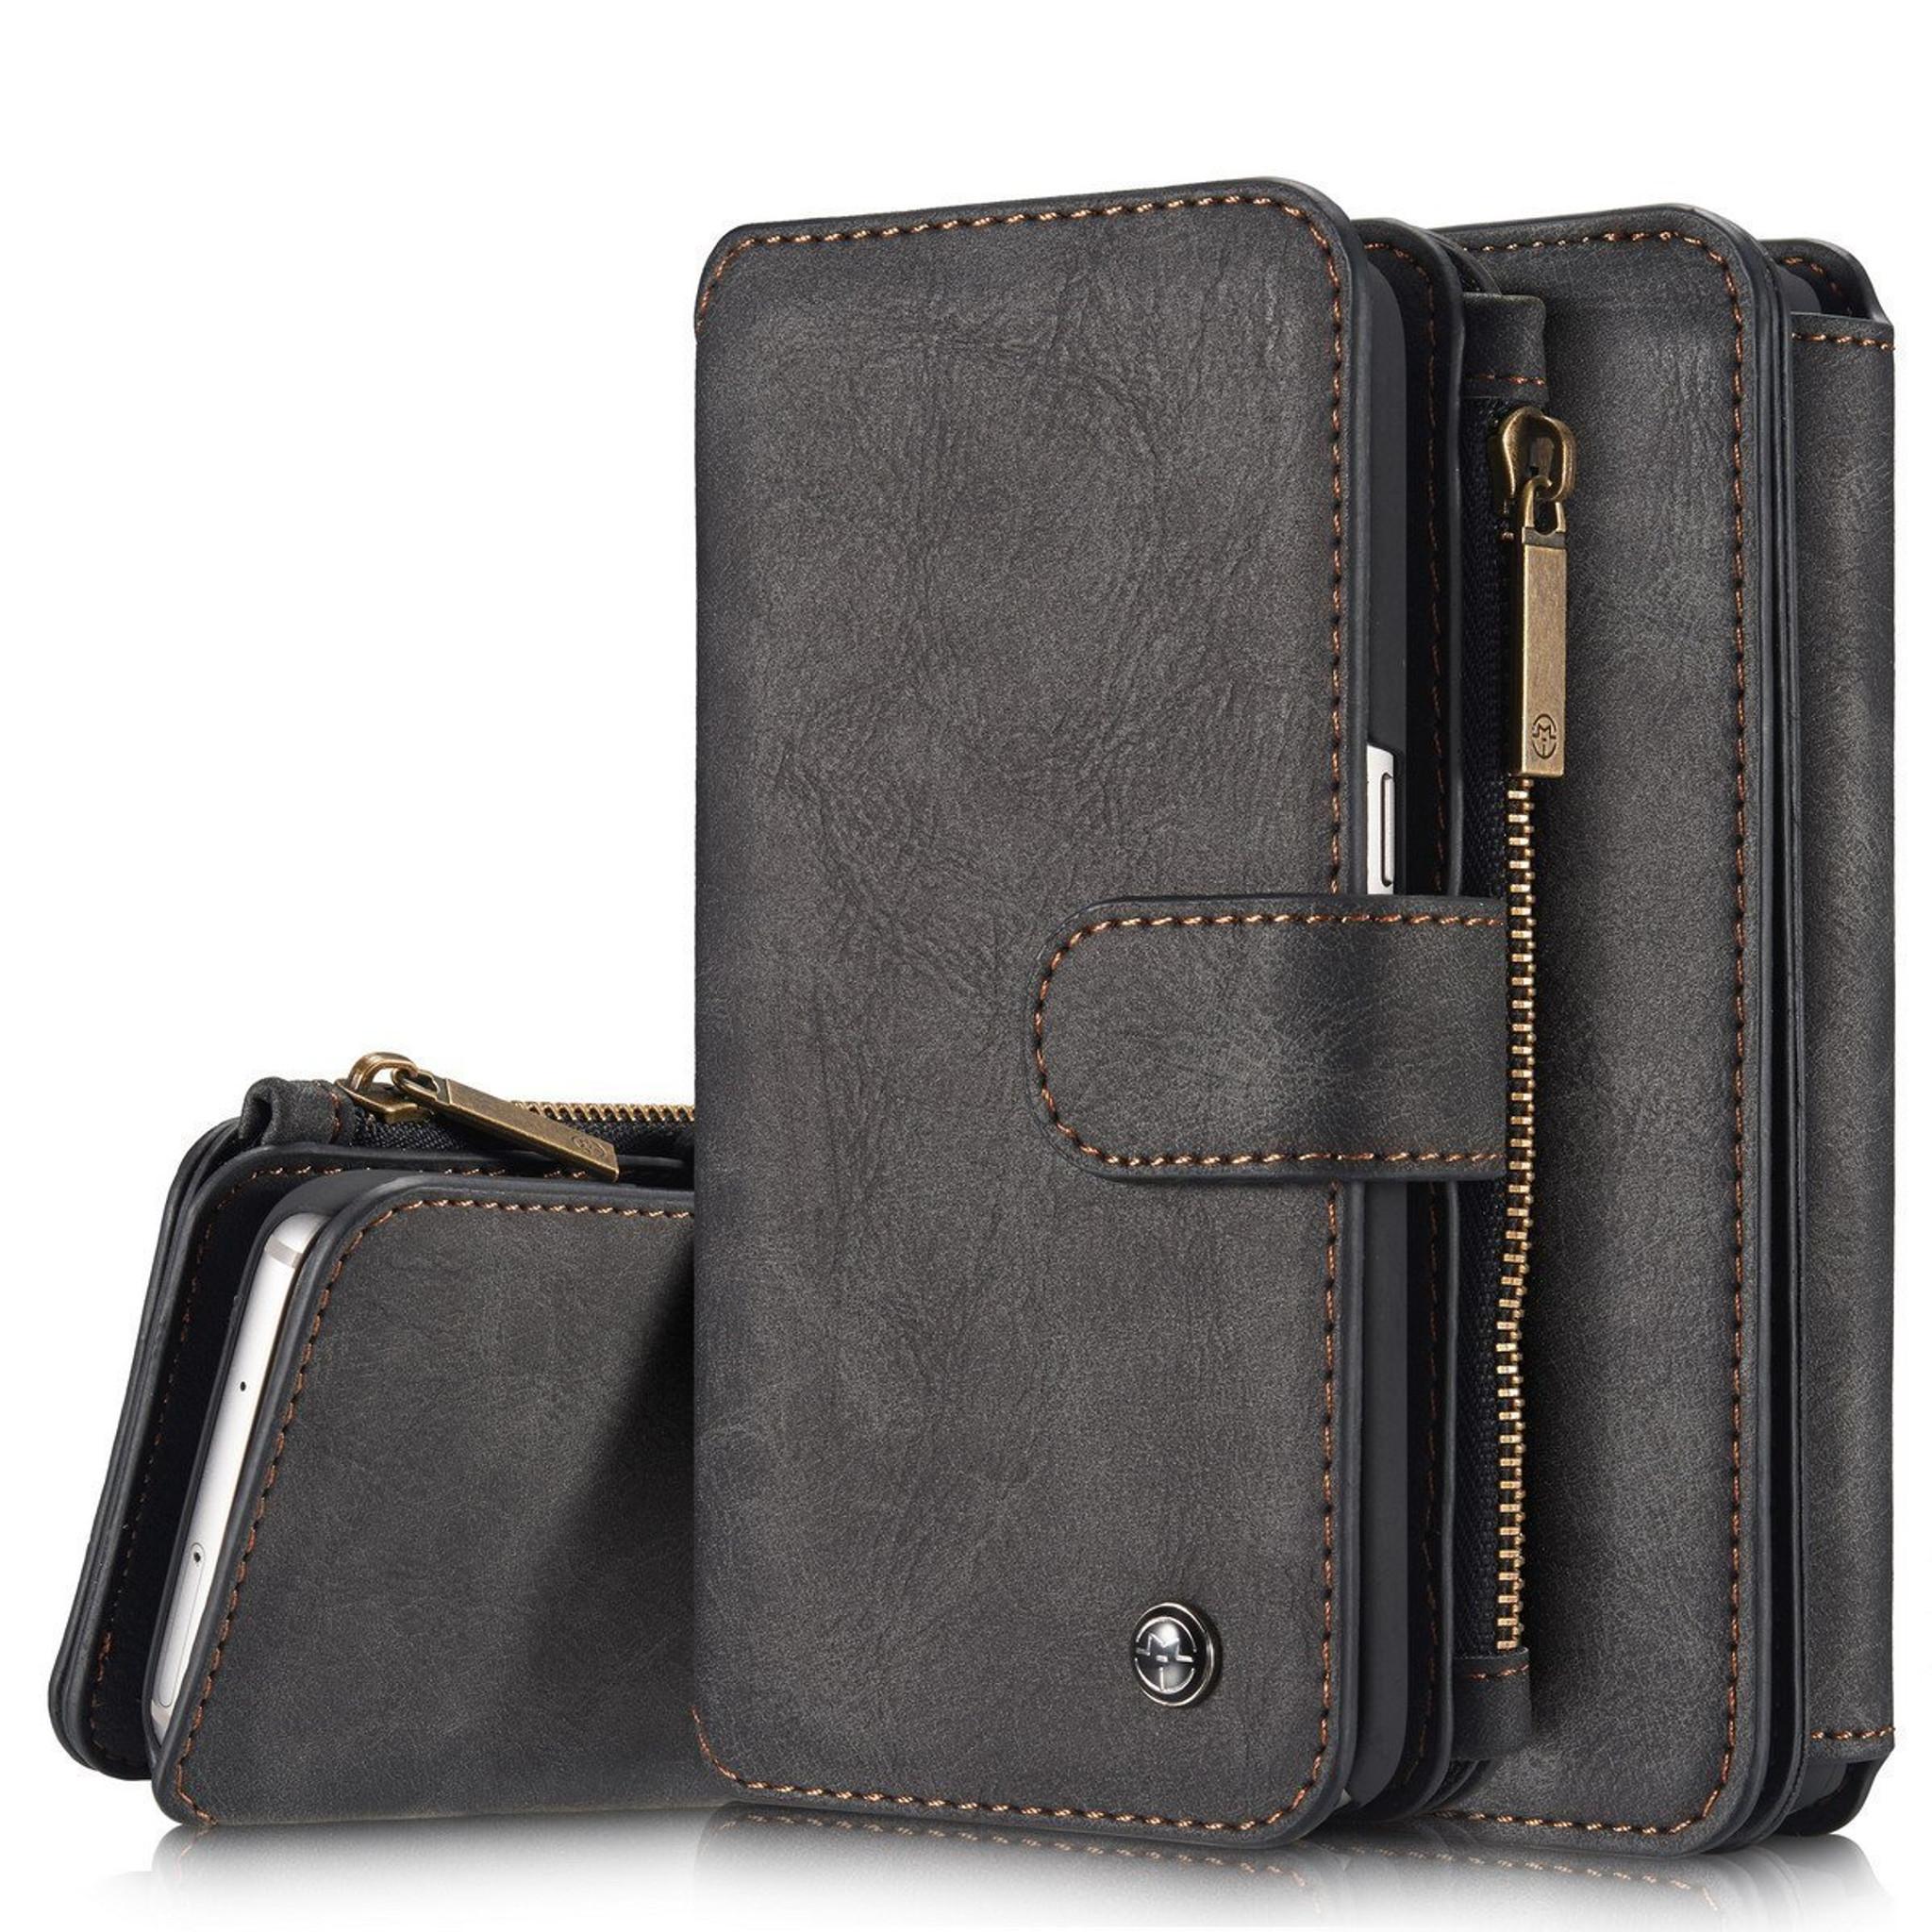 samsung galaxy s7 edge purse case